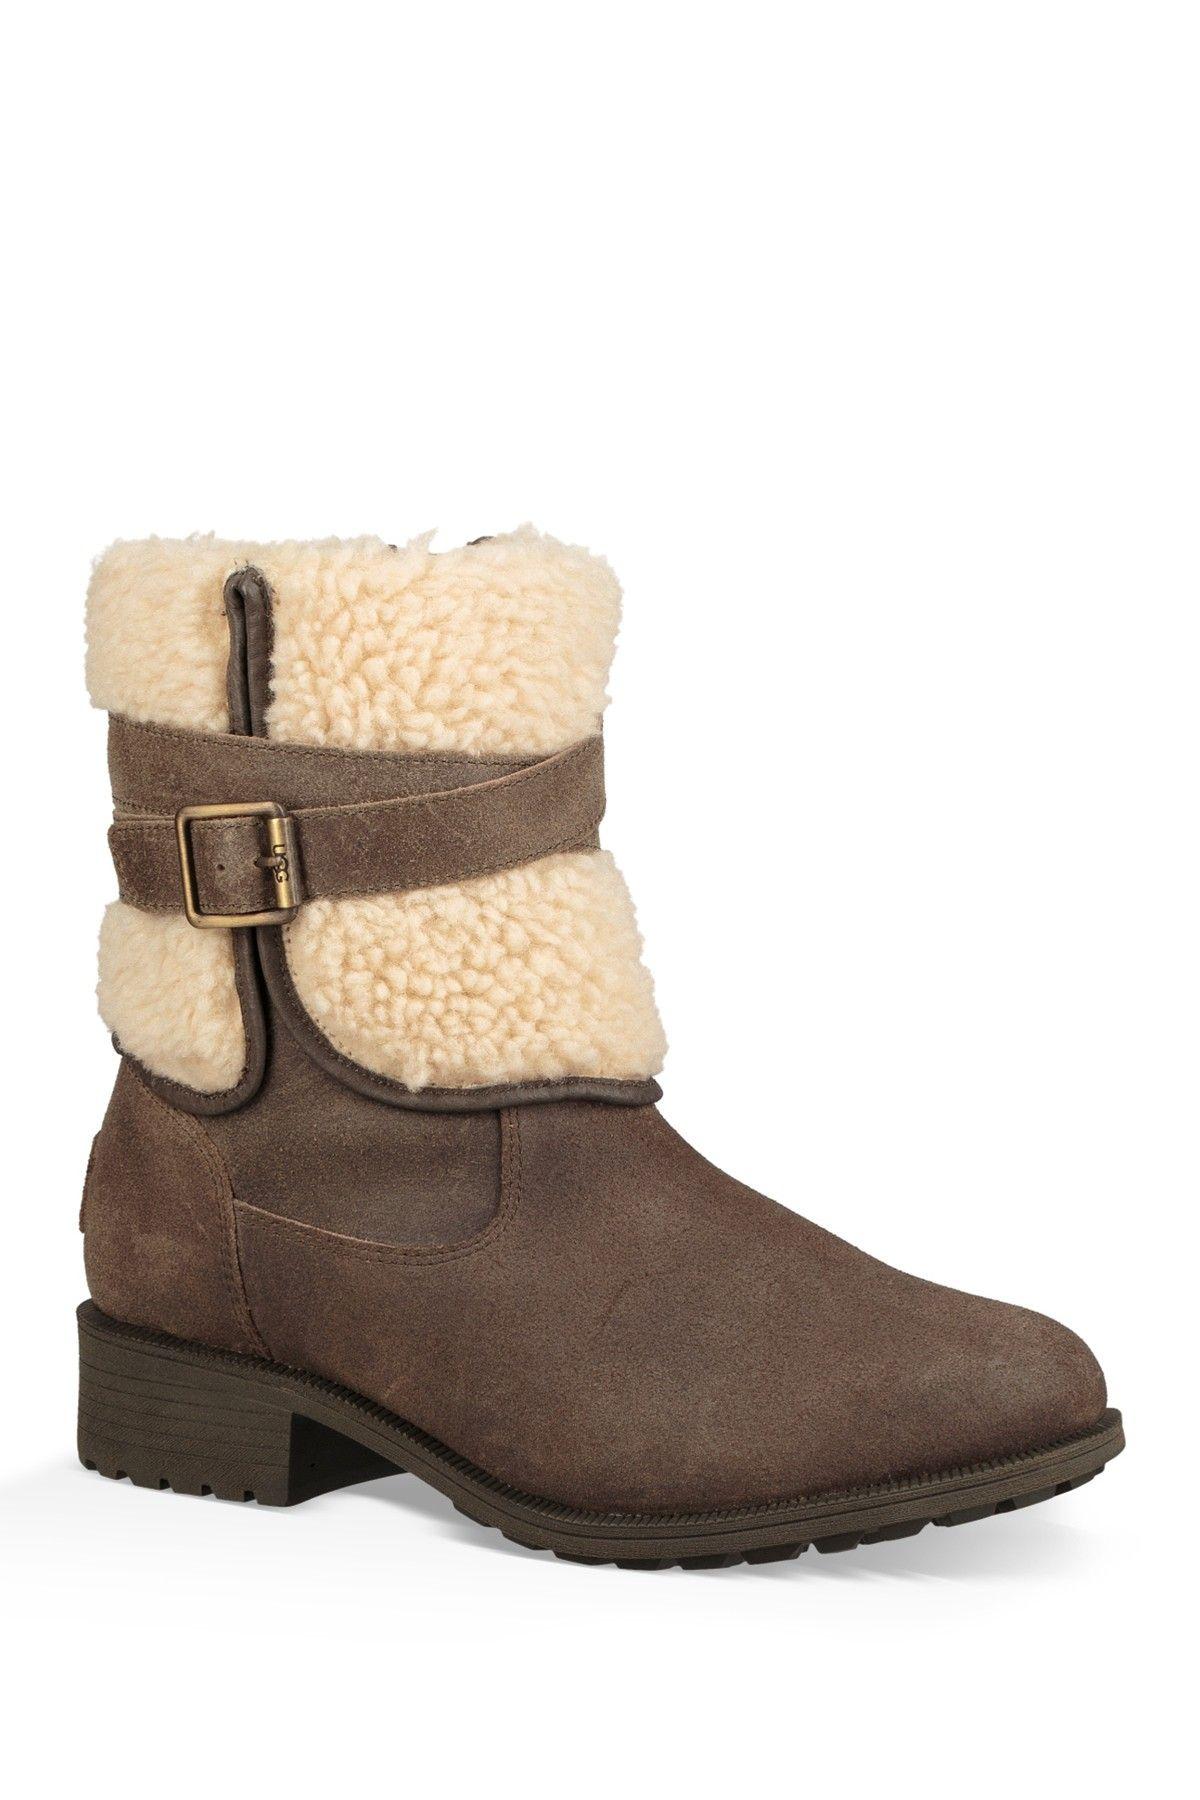 blayre iii wool cuff bootie